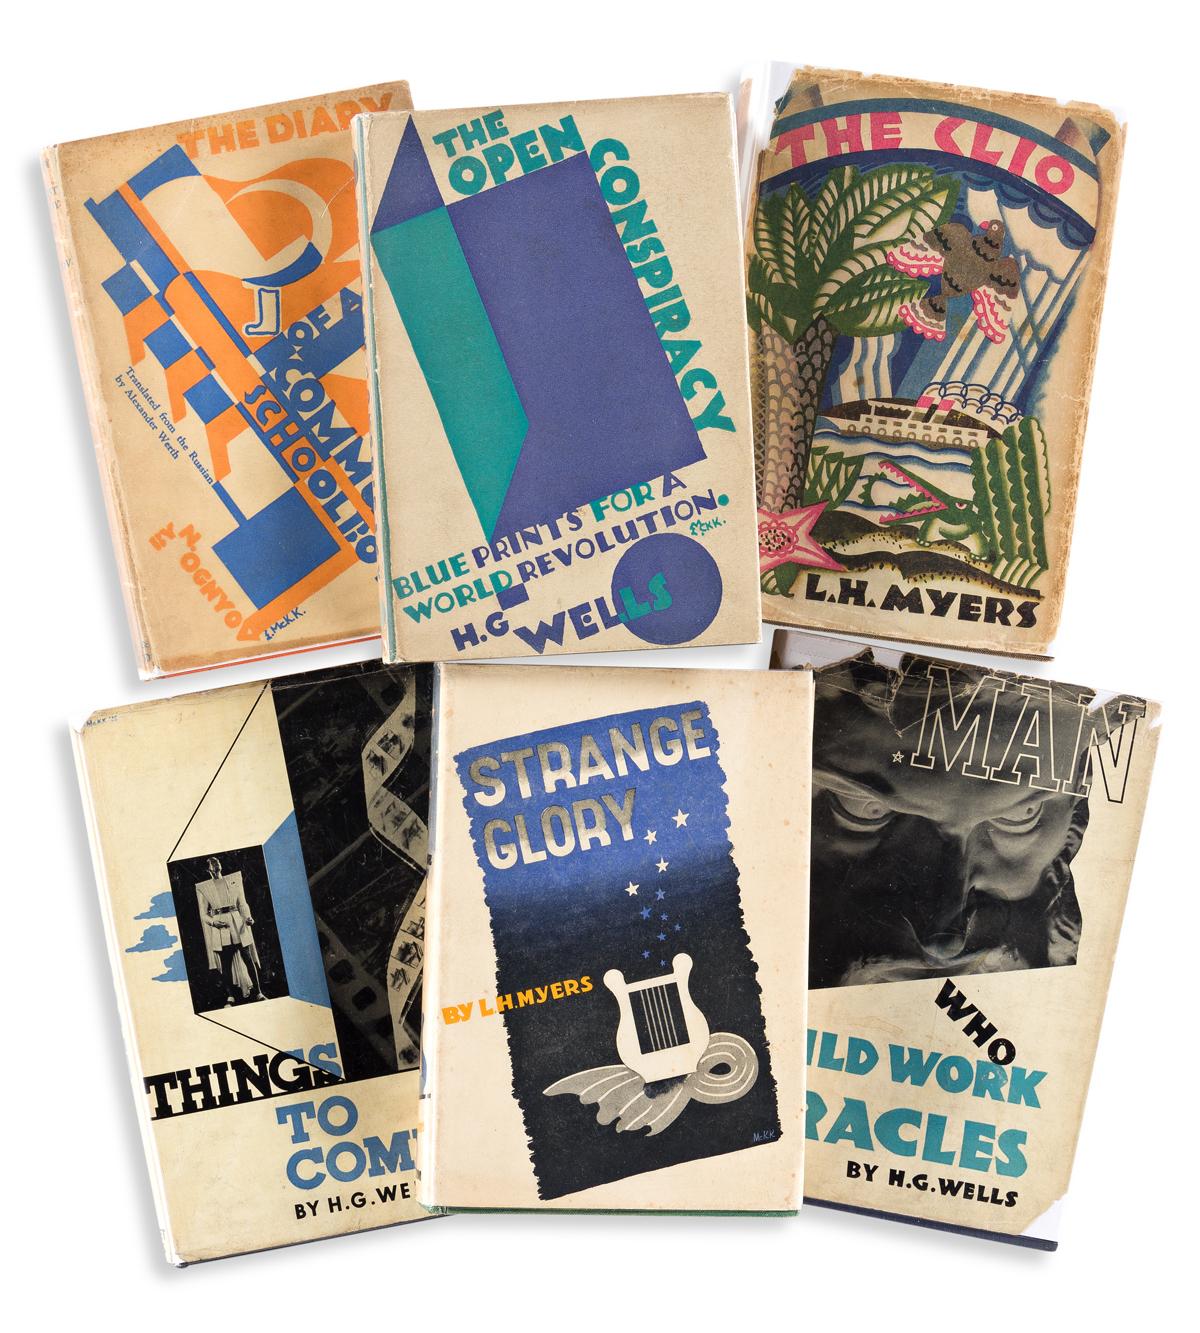 EDWARD MCKNIGHT KAUFFER (1890-1954).  [ART DECO DUST JACKETS.] Group of 6 books. 1925-1936. Sizes vary.